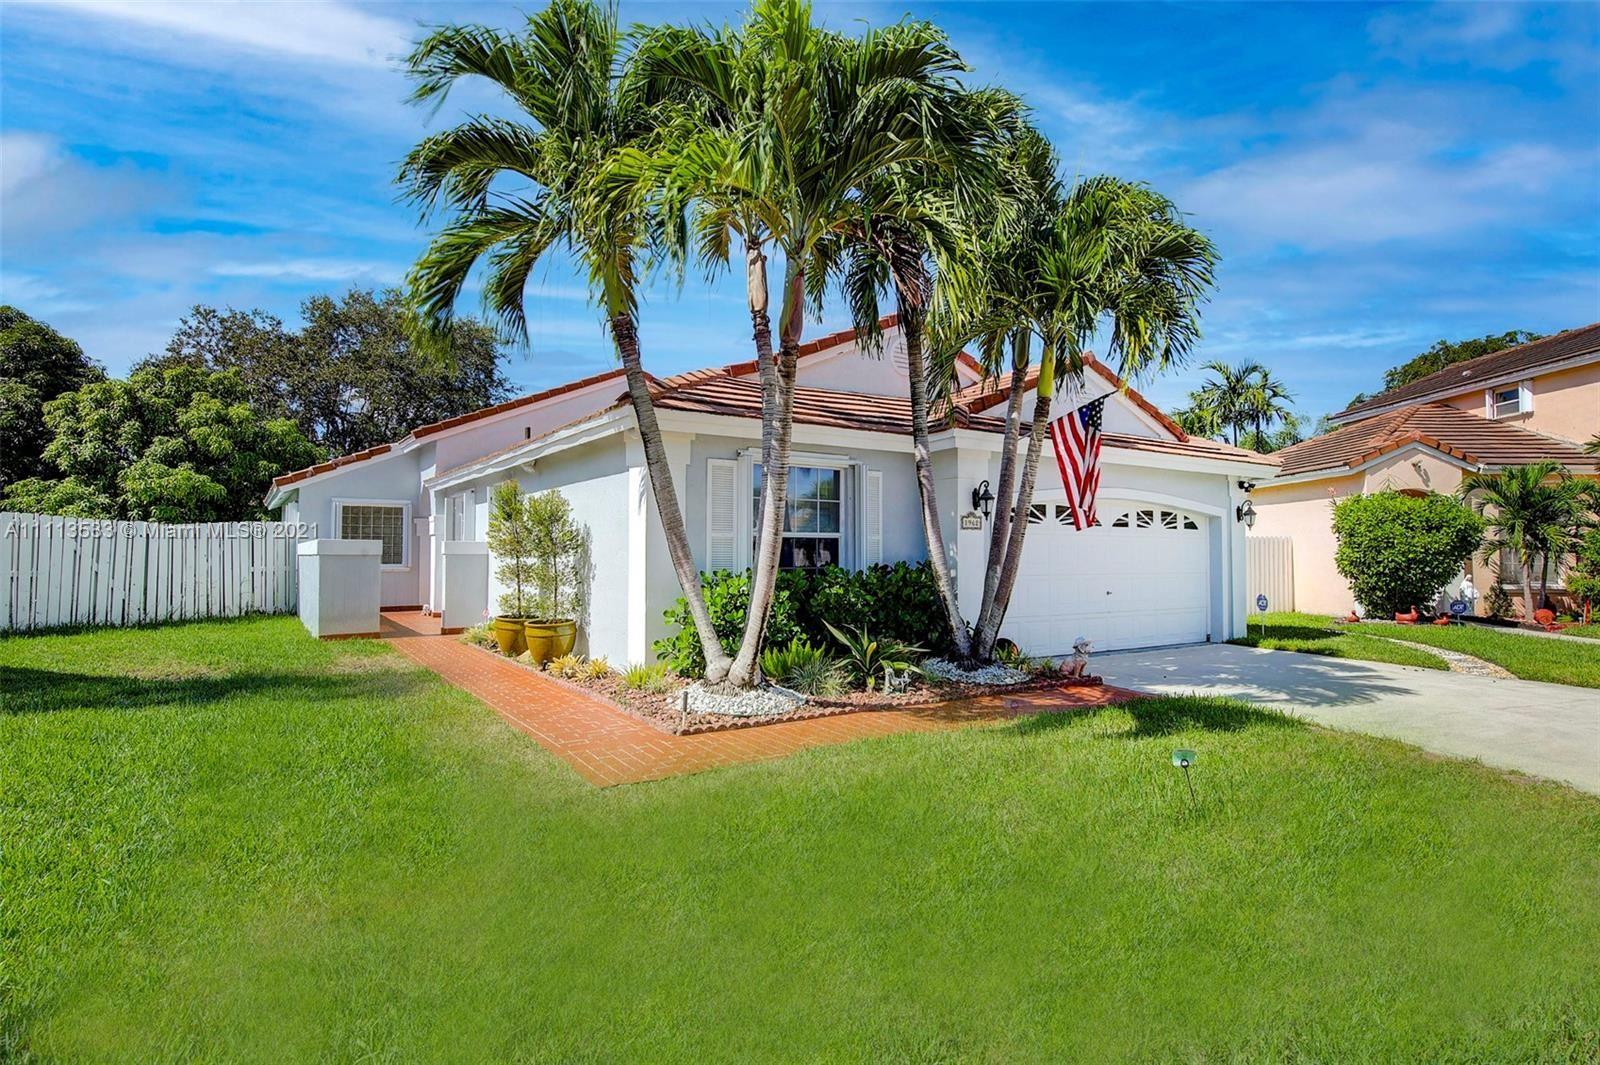 1962 NW 181st Ave, Pembroke Pines, FL 33029 - #: A11113533